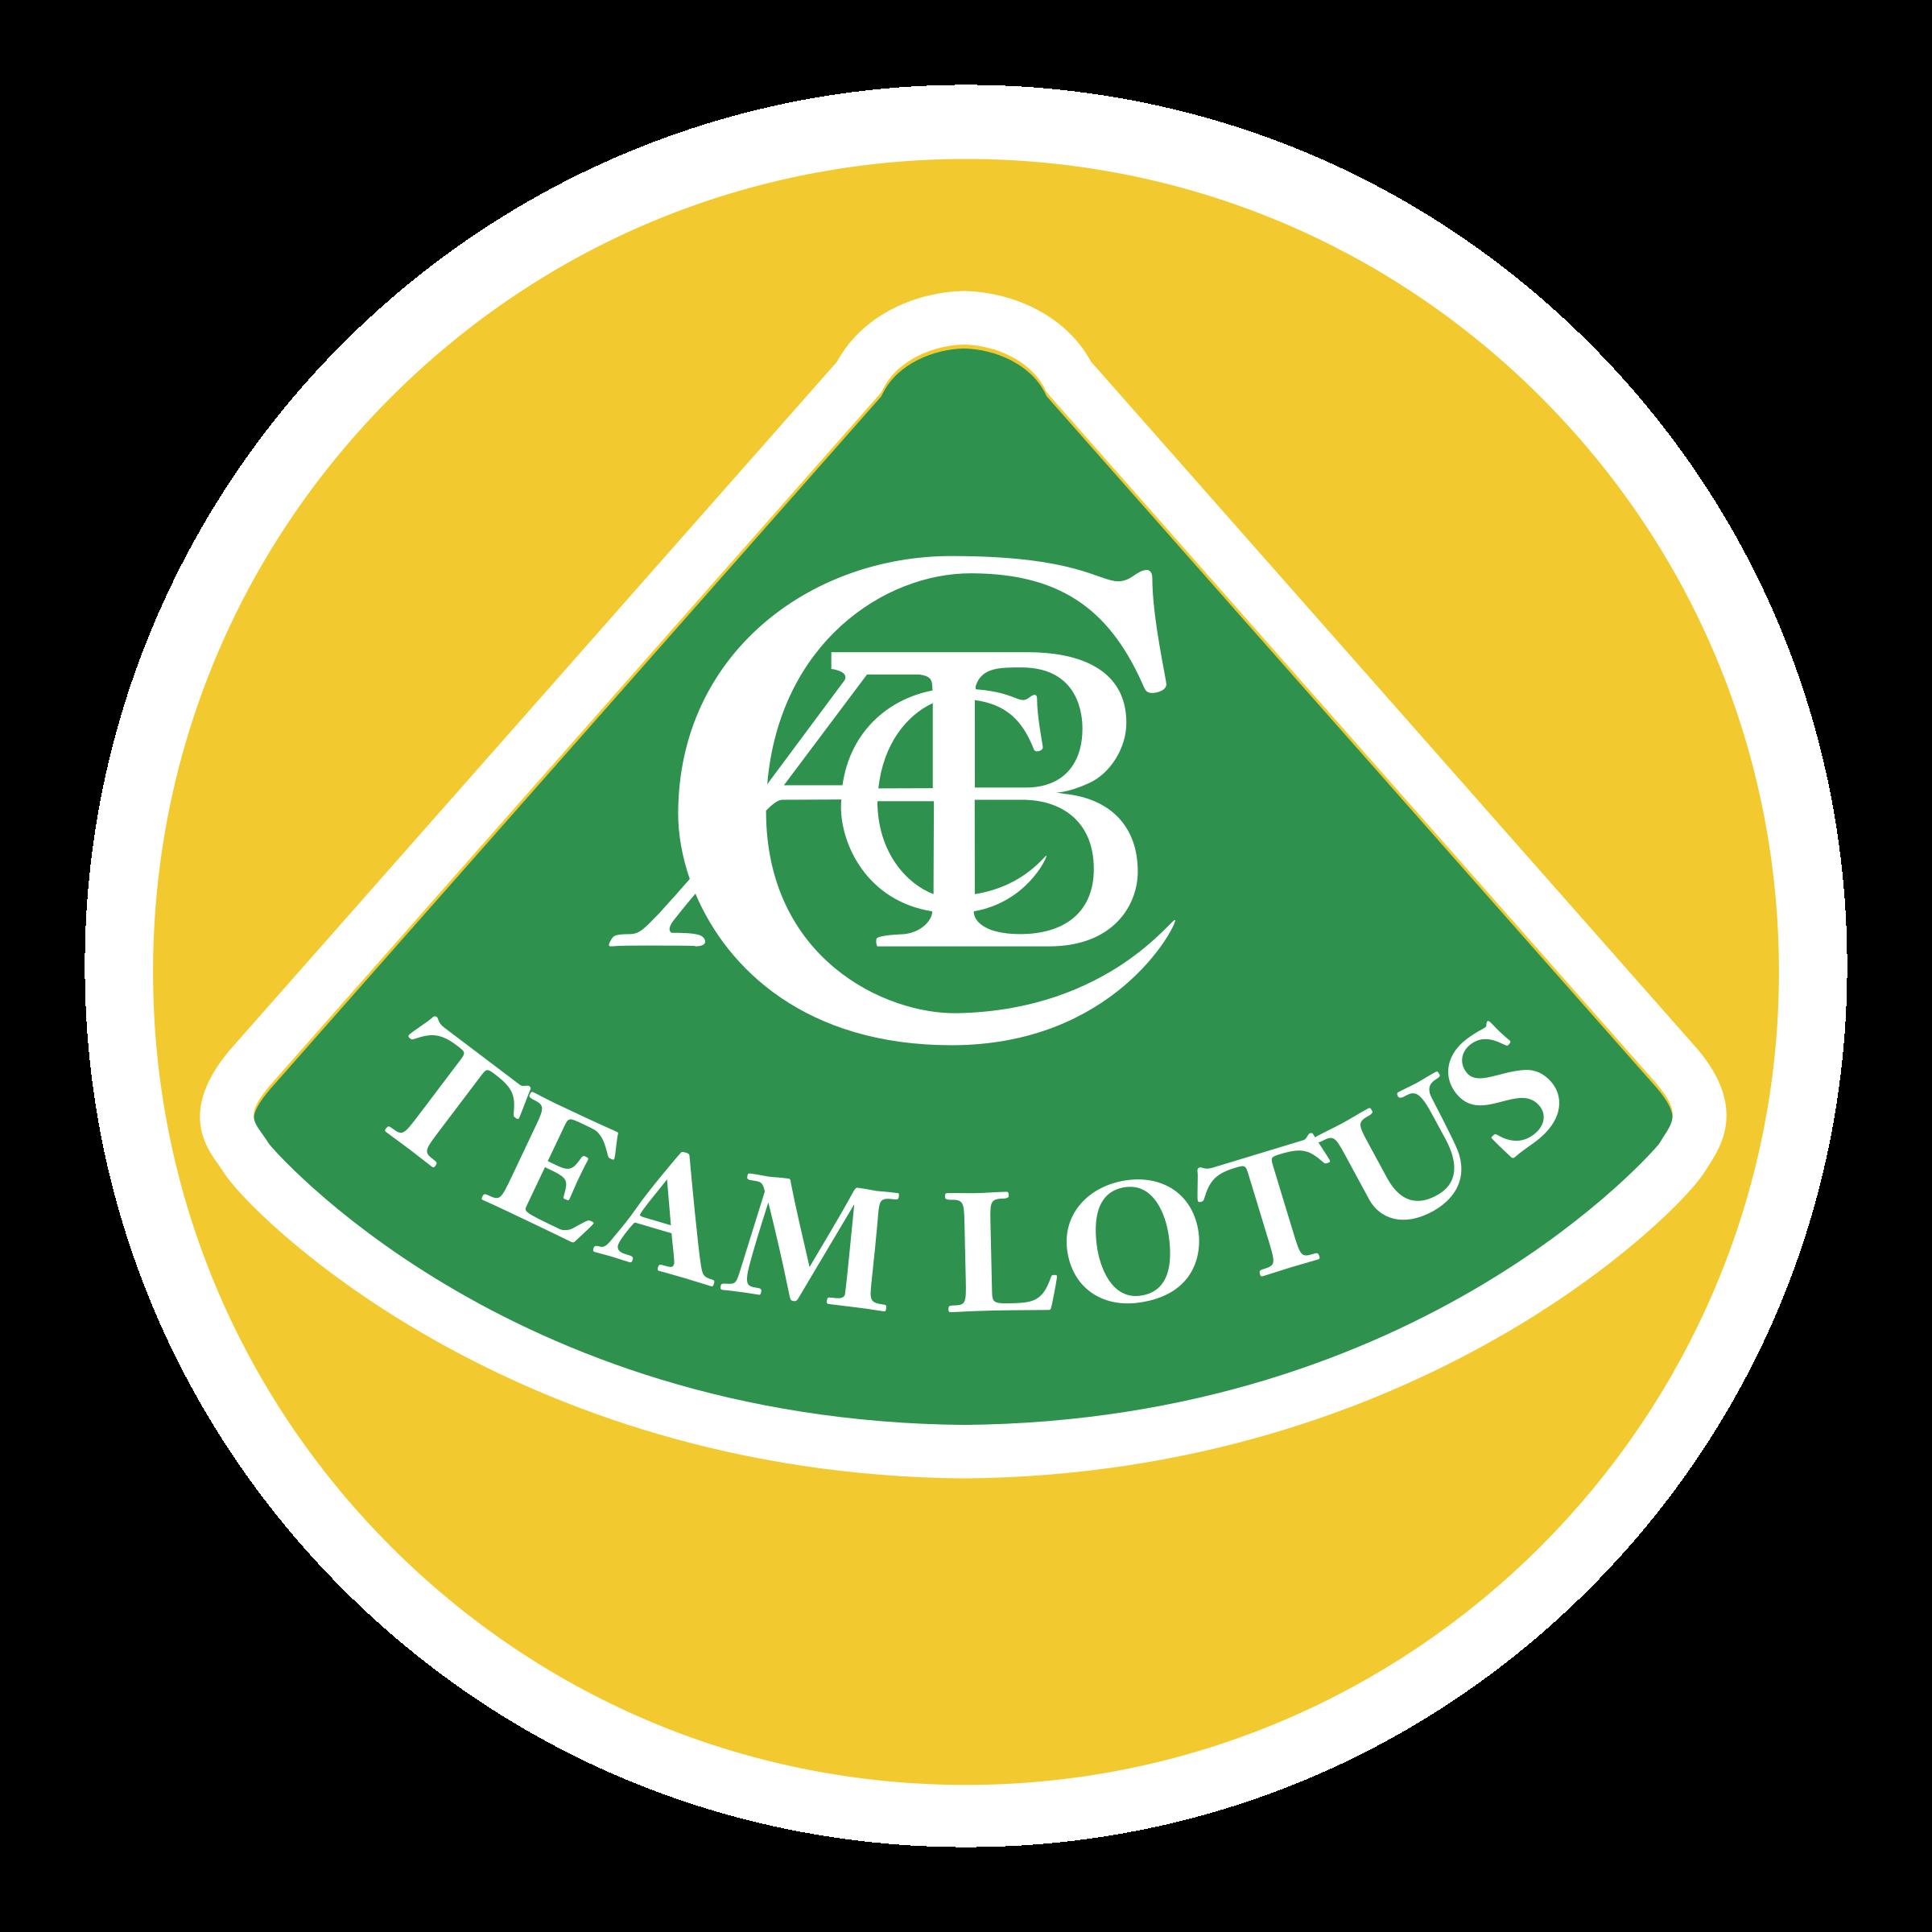 Lotus F1 Team Logo Png Transparent Svg Vector Freebie Supply